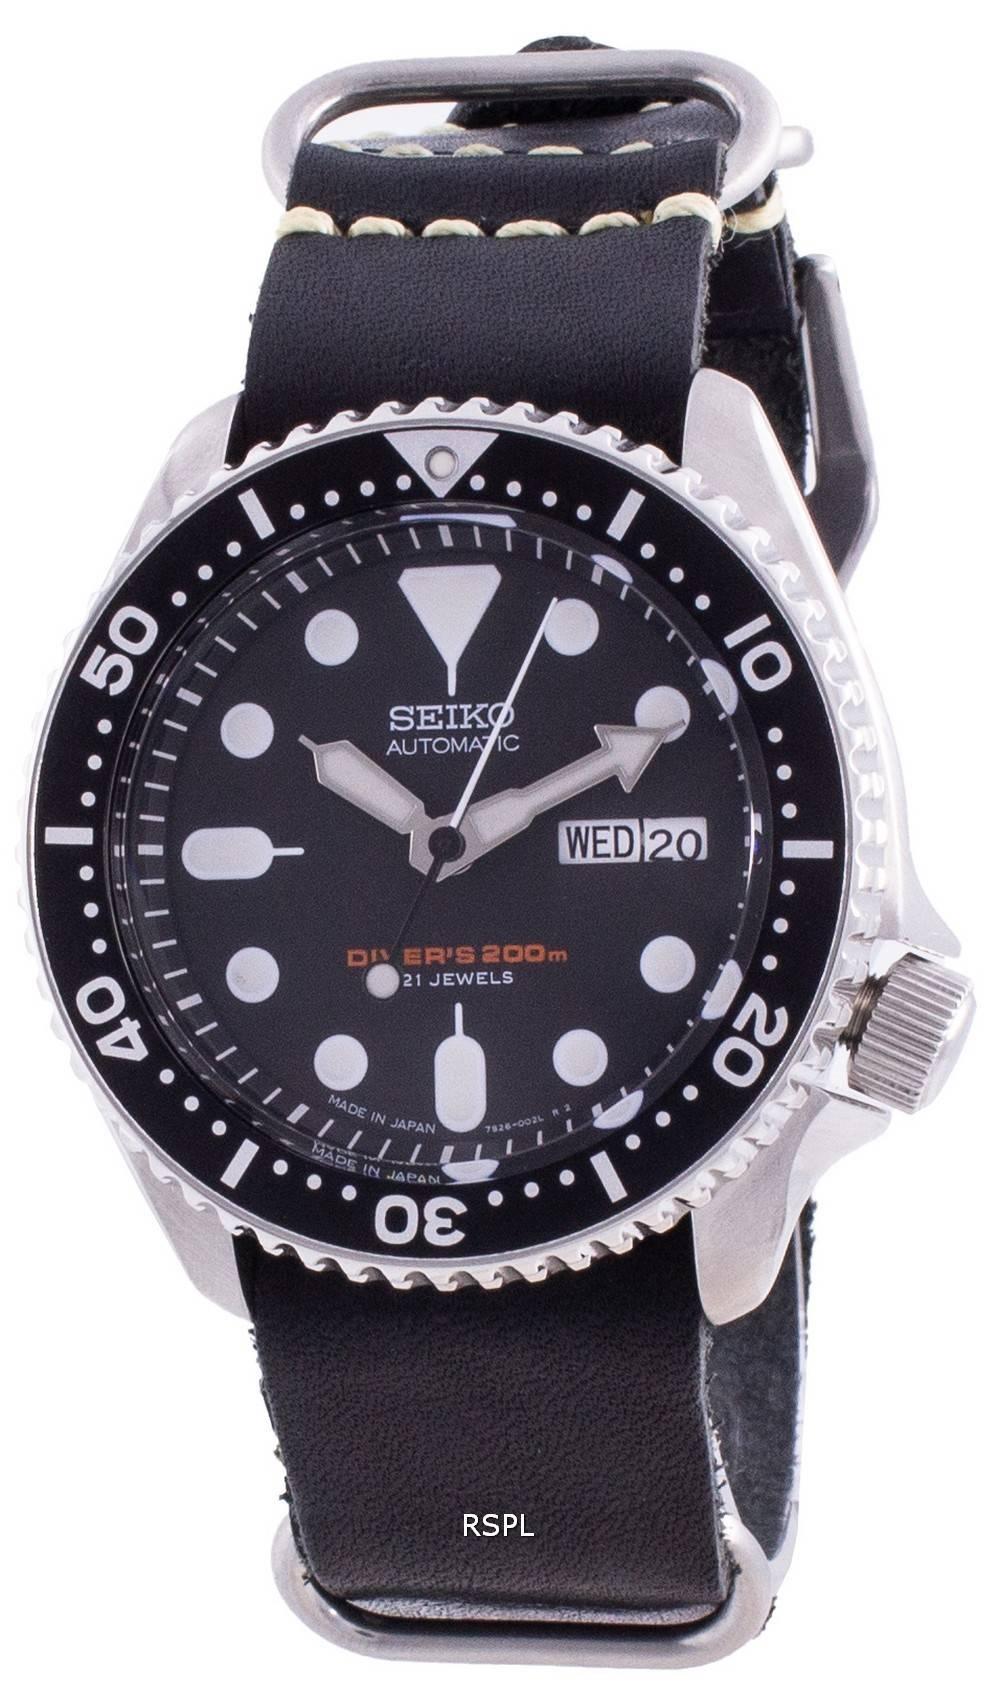 Seiko Automatic Diver&#39,s SKX007J1-var-LS19 200M Japan Made Miesten kello